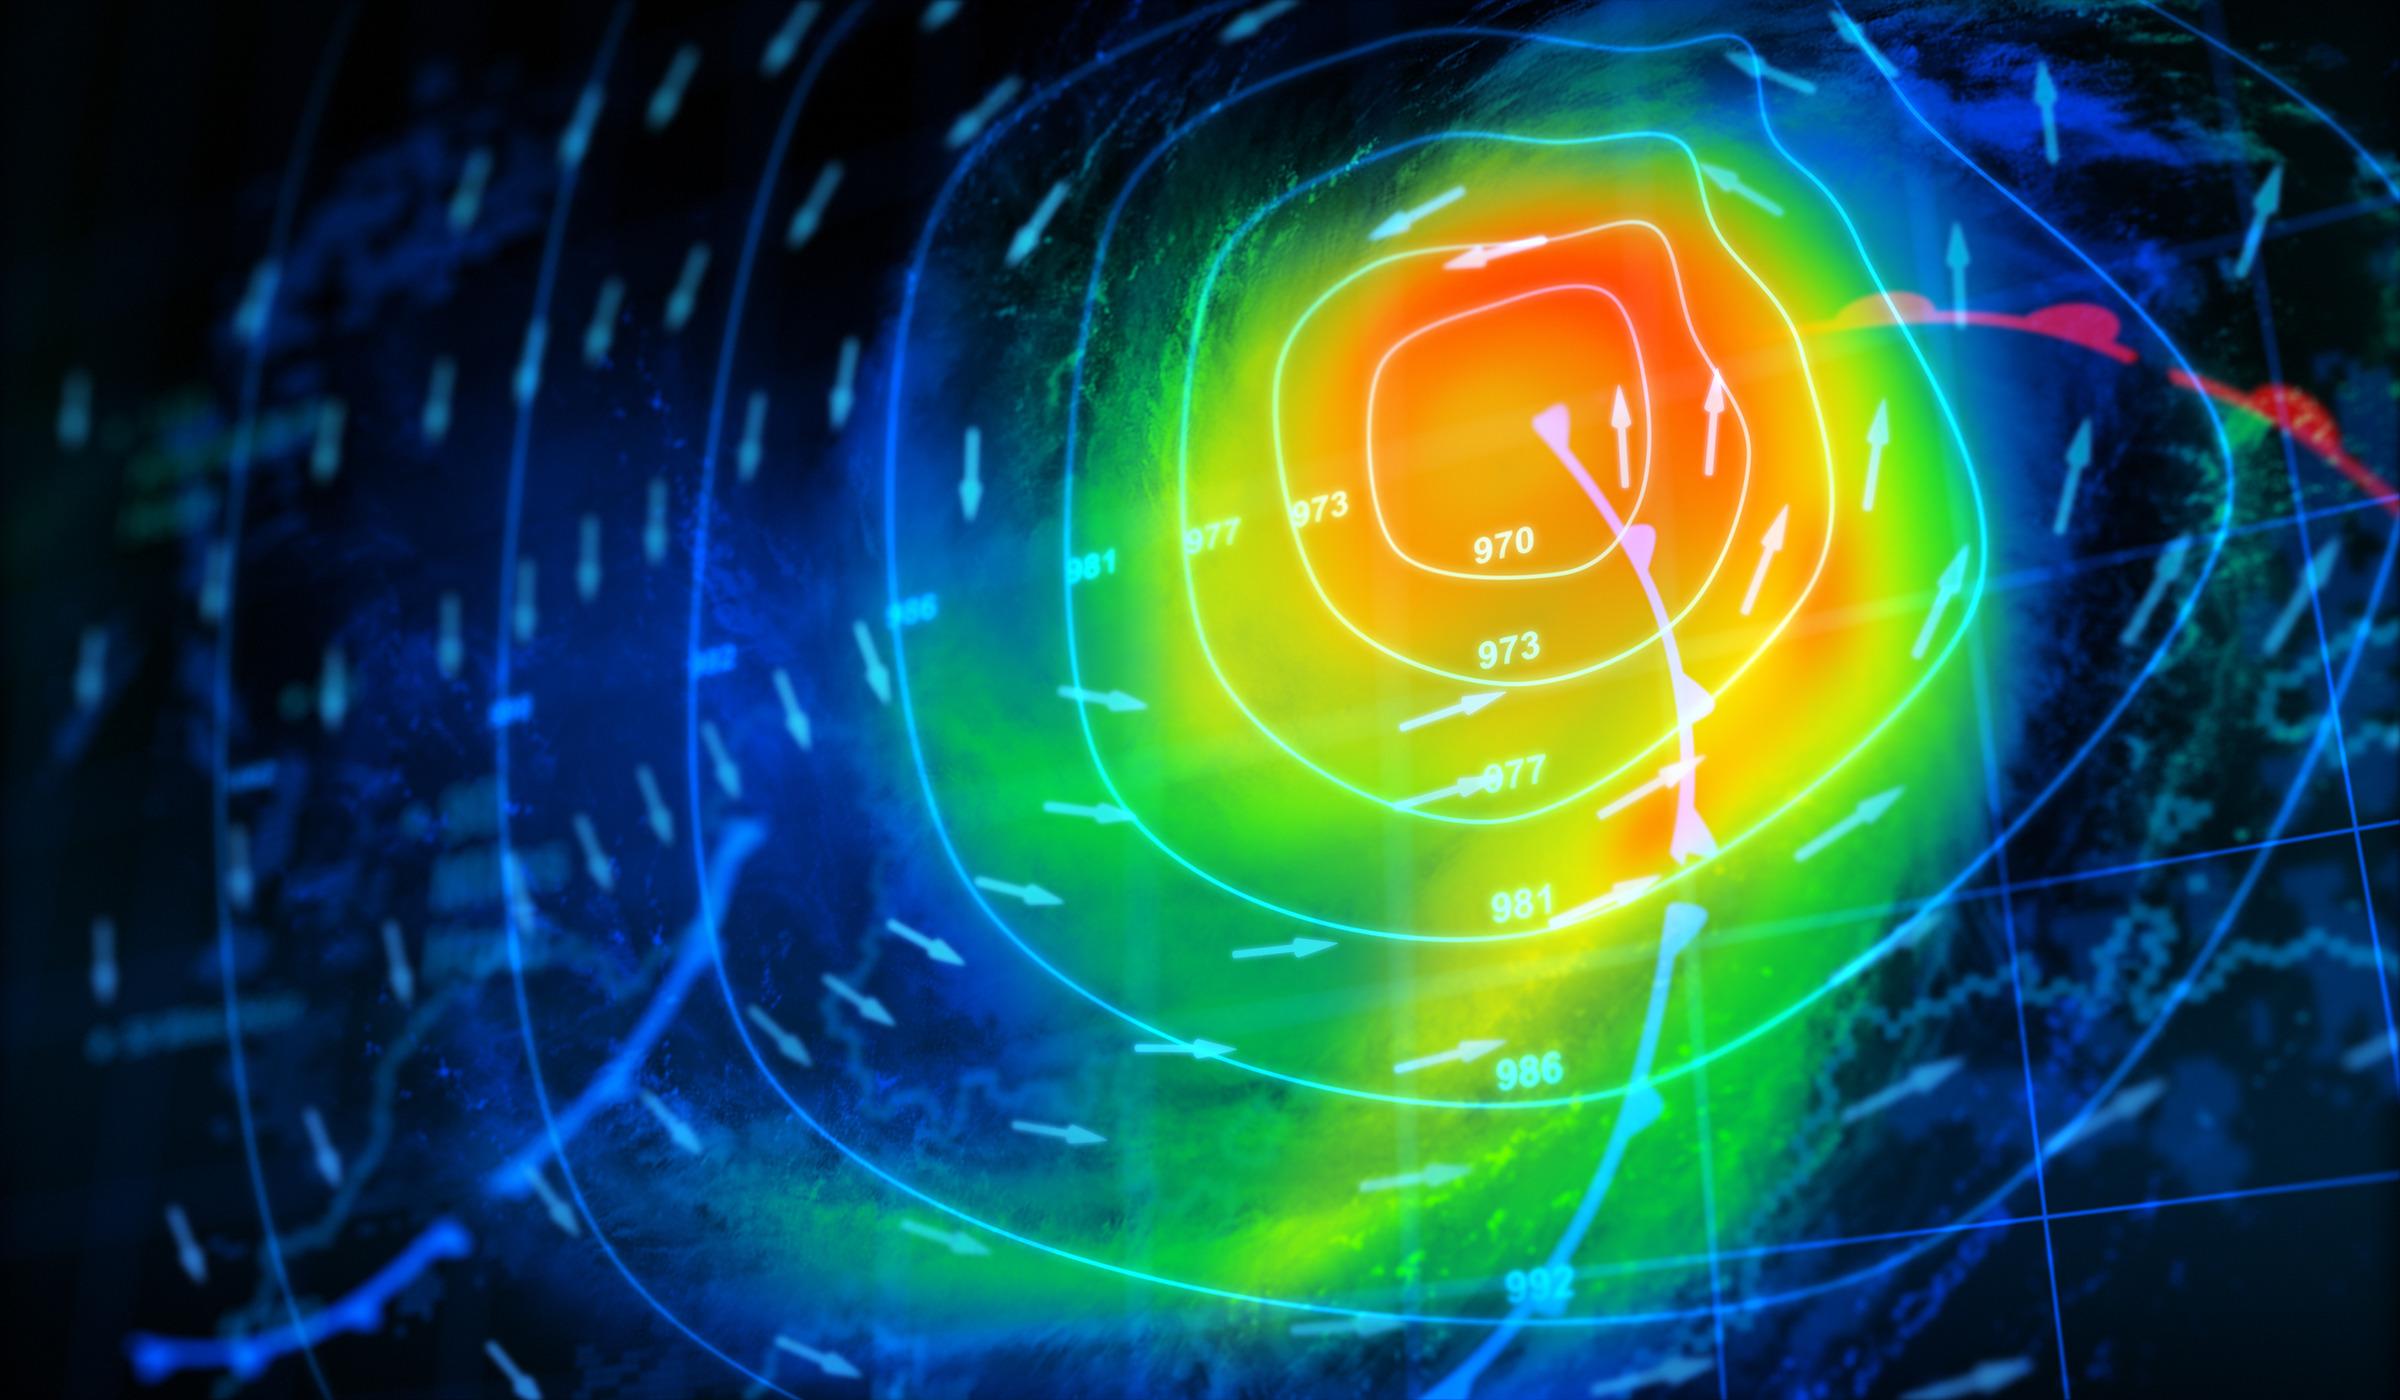 How Typhoon Lekima may be impacting your business